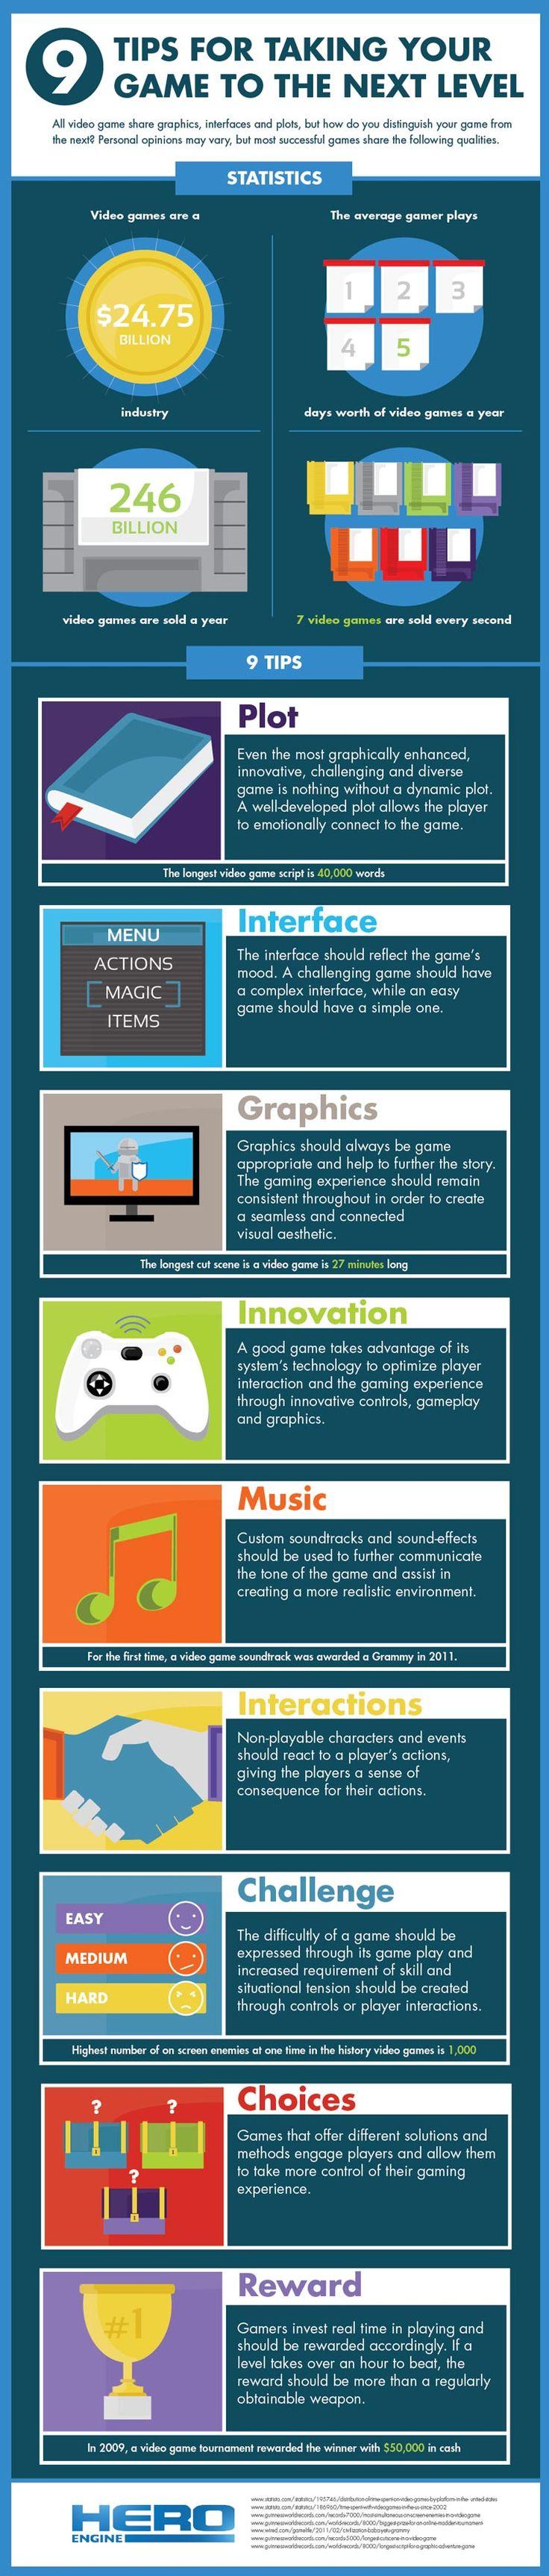 the 9 tips for better game development - Game Design Ideas